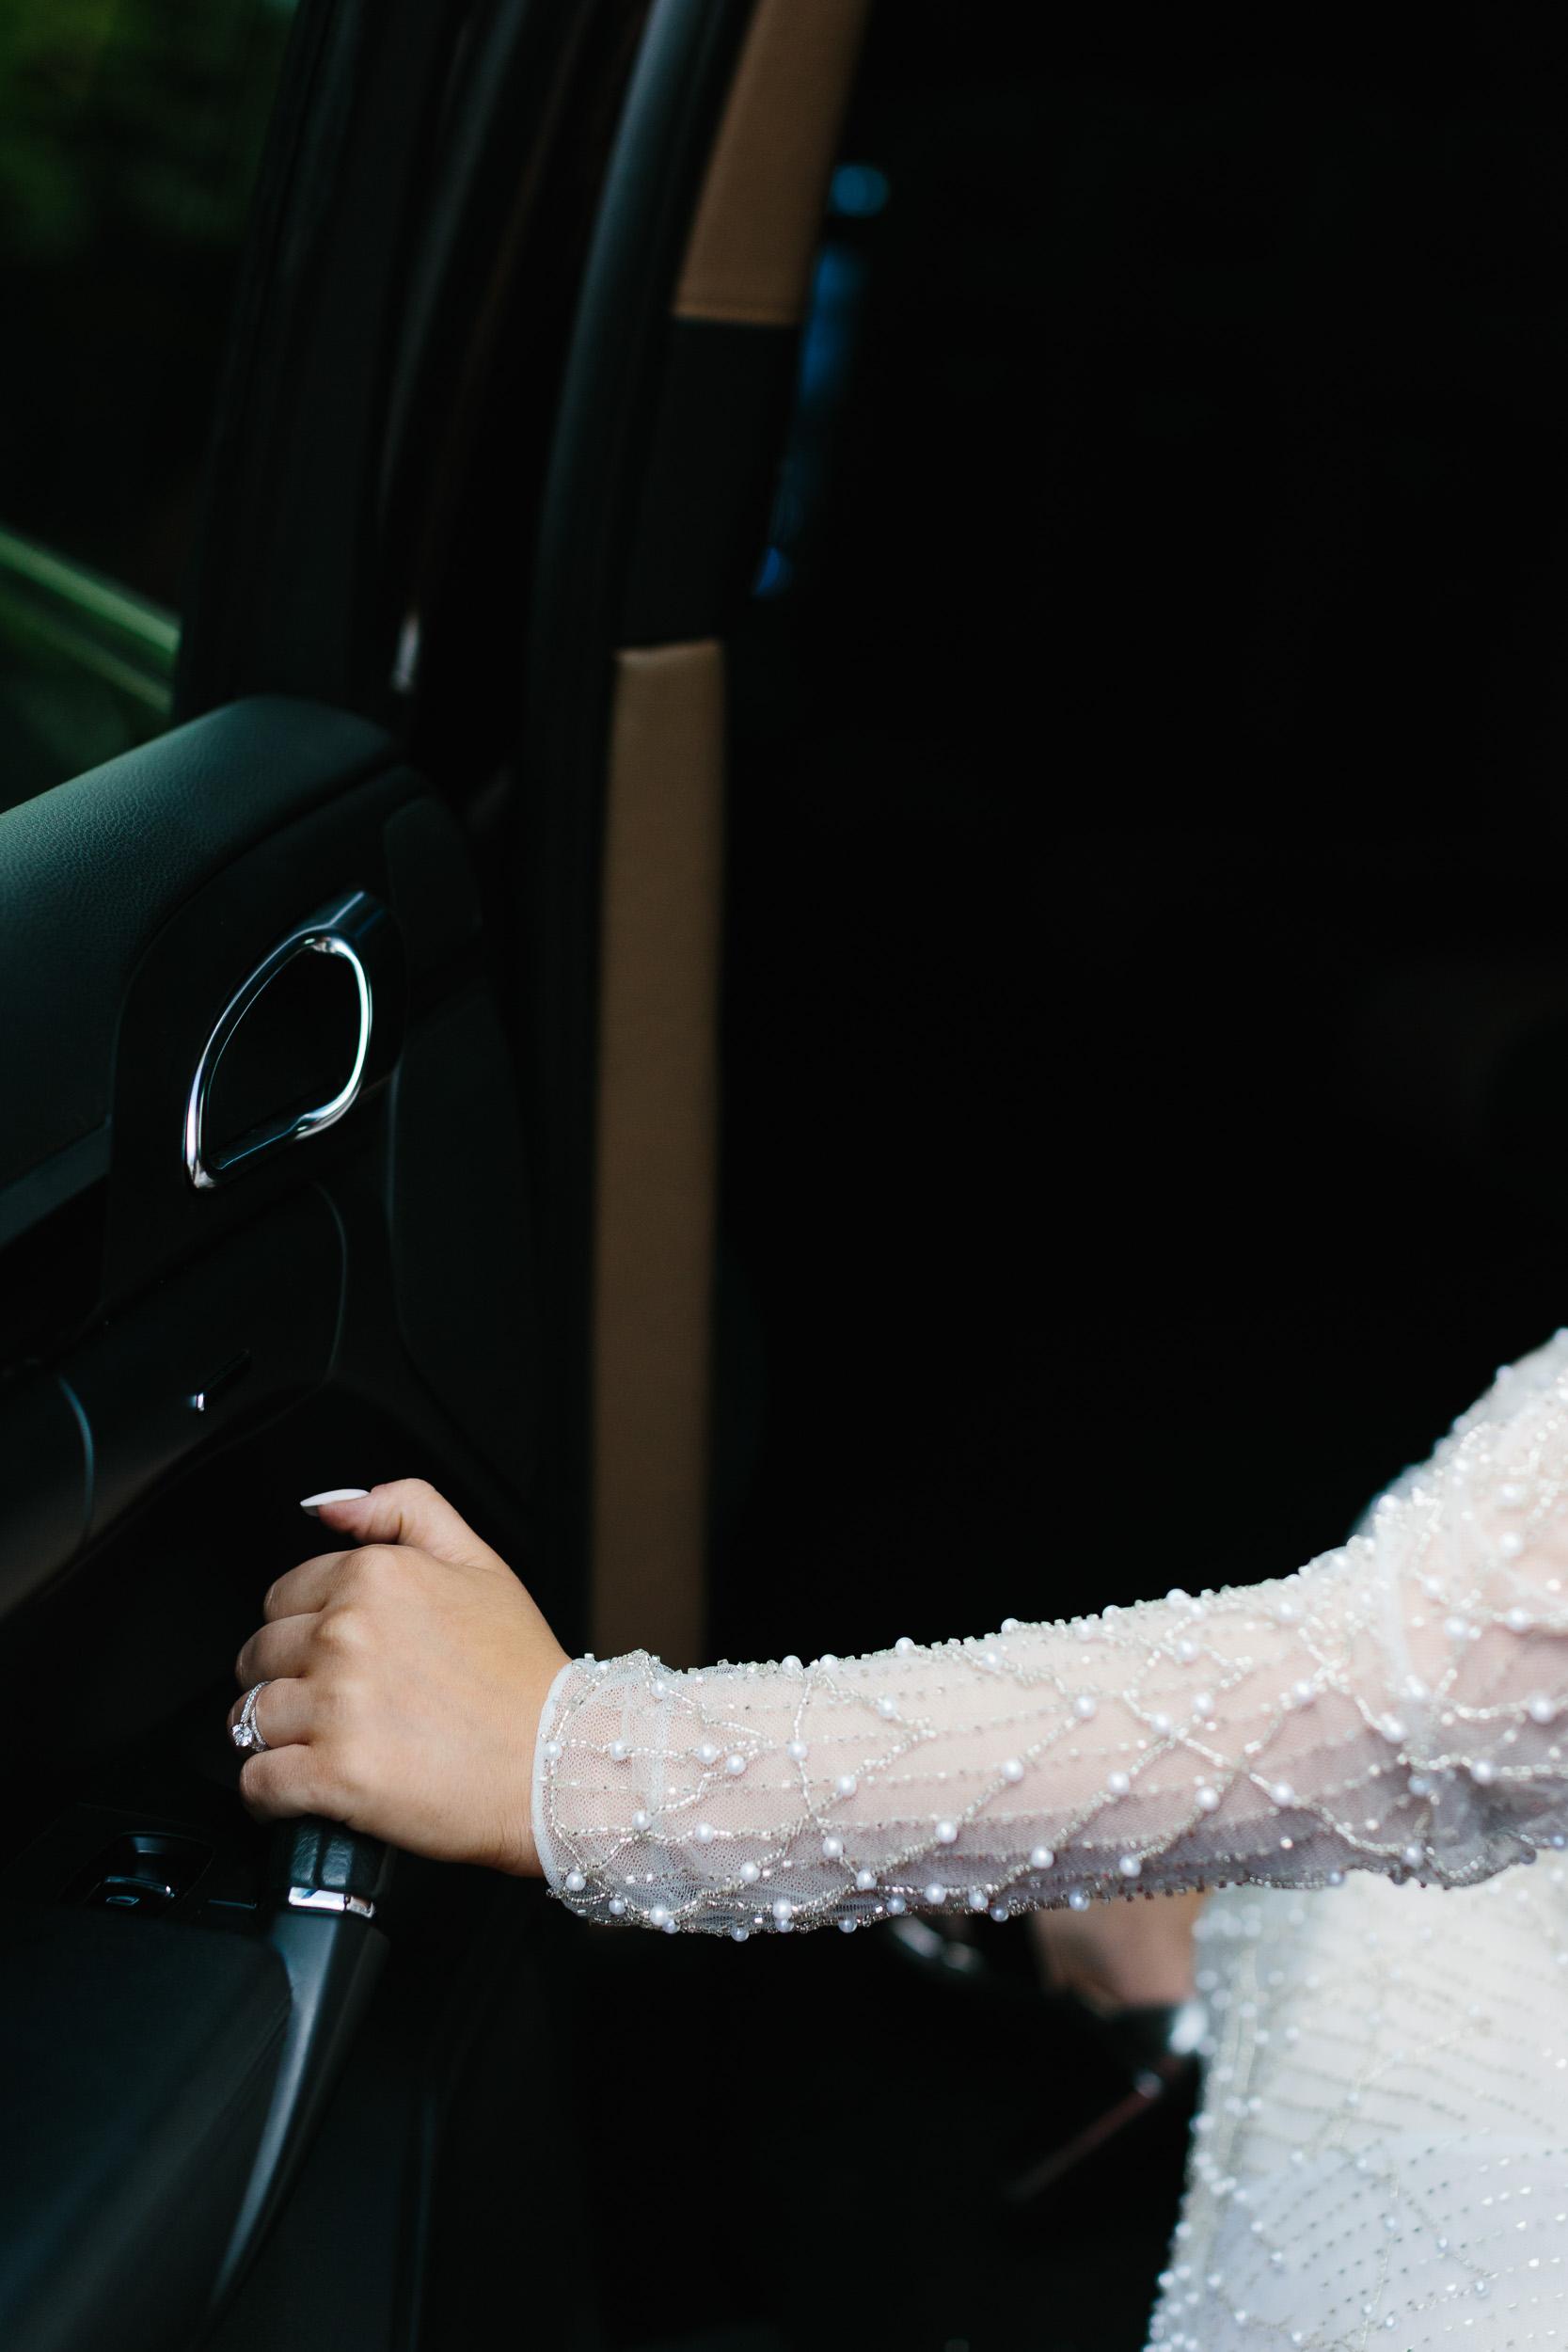 Kas-Richards-Wedding-Photographer-Melbourne-City-Wedding-Alto-Event-Space-Jane-Hill-Bridal-Gown-20.jpg